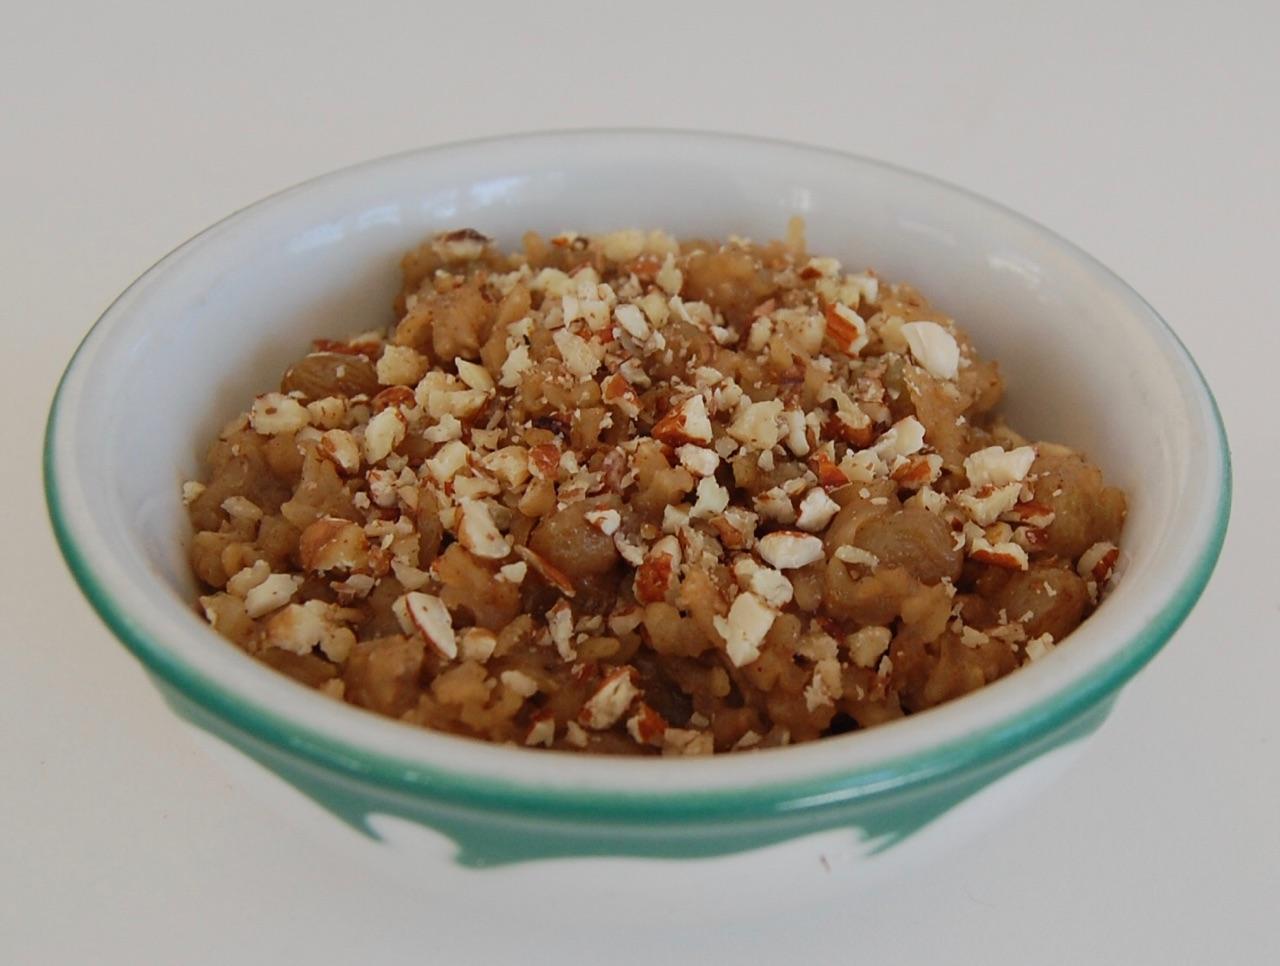 Rice Pudding w honey%2c nuts & dried fruit.JPG